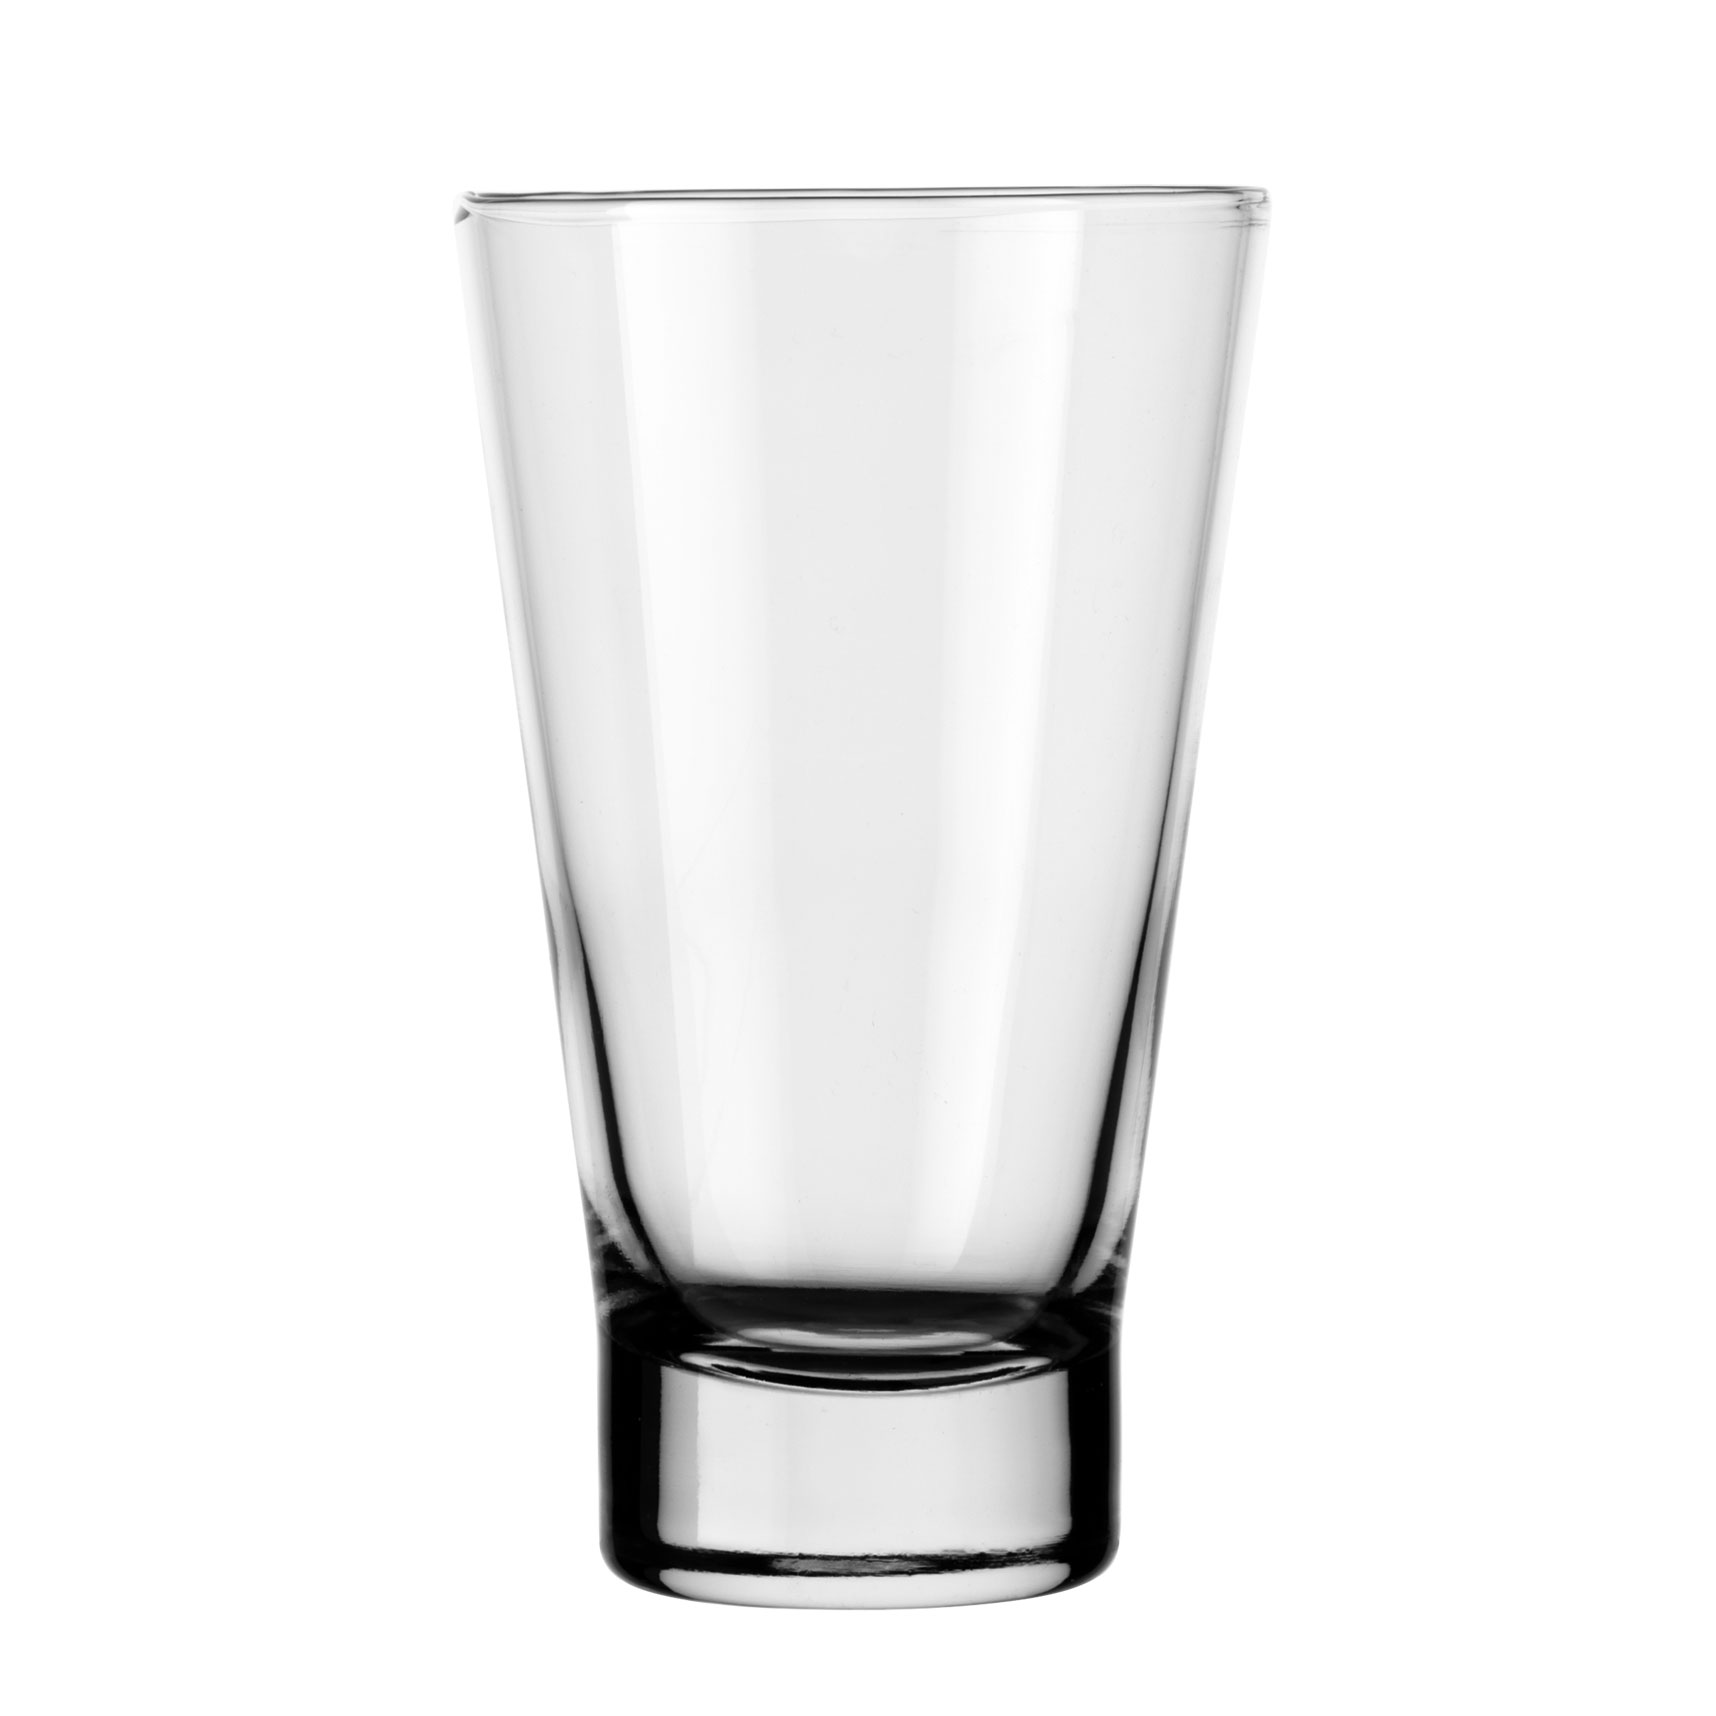 Libbey Glass 2042 glass, hi ball